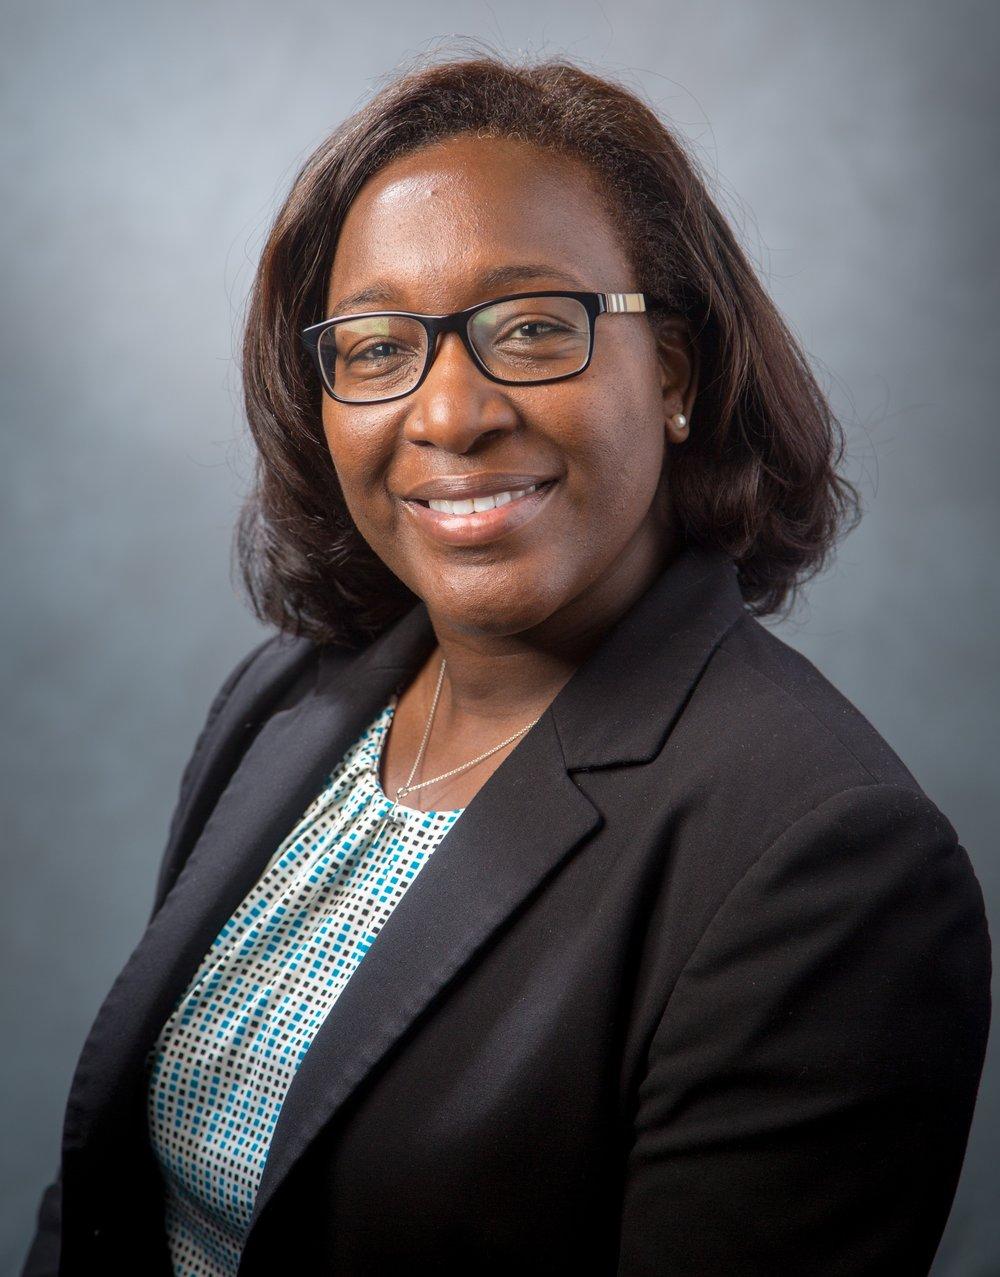 Bridgett White - City of San Antonio, planning department director